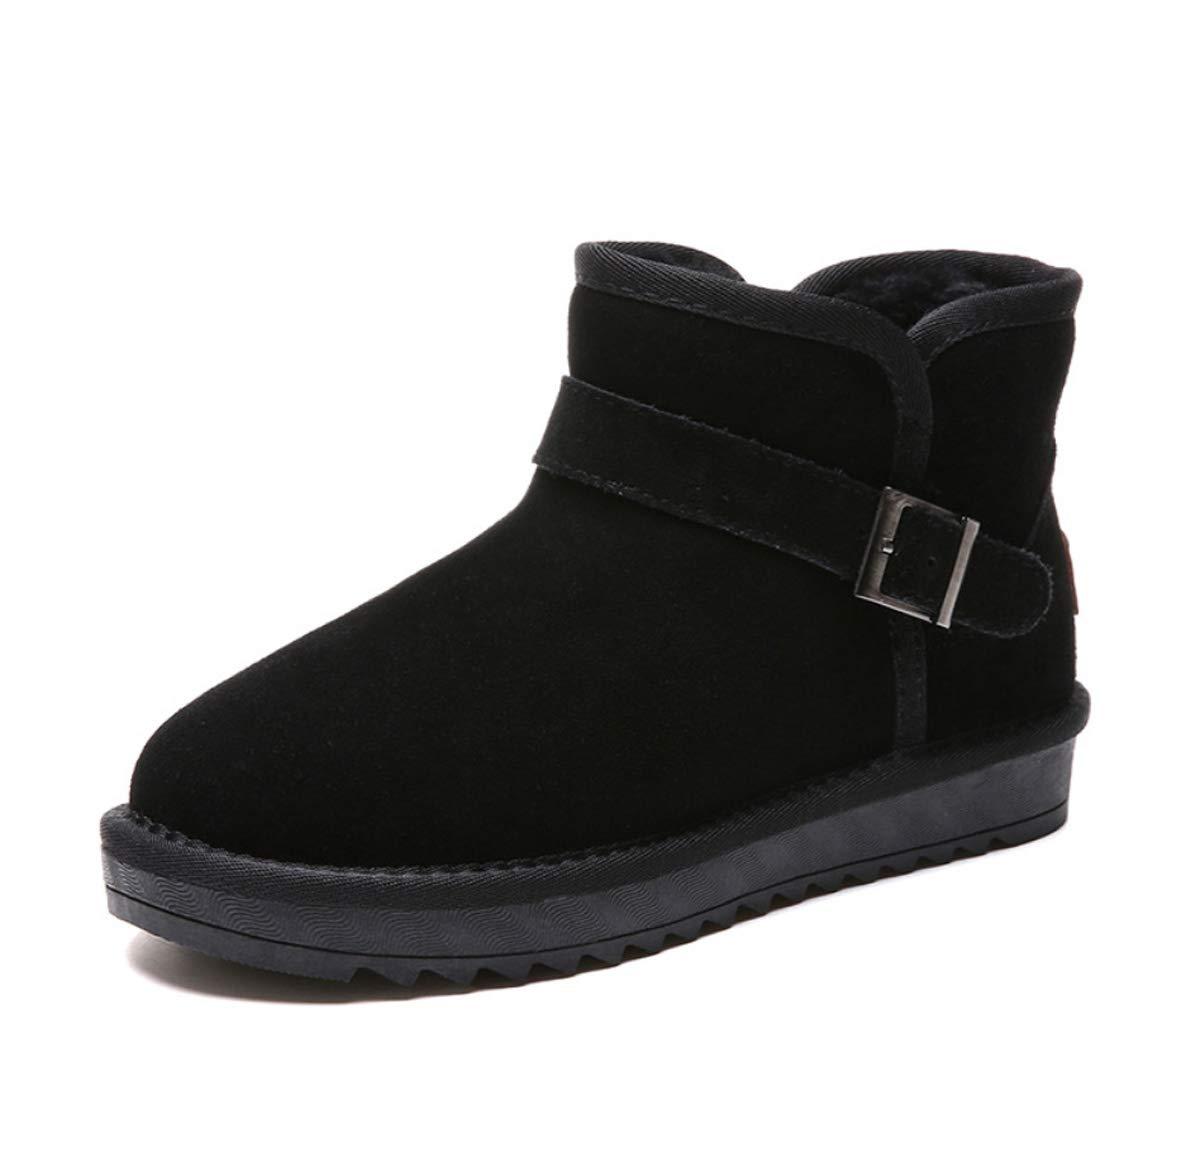 DANDANJIE DamenSnow Stiefel Schuhe Winter Warm Lining Stiefel Damen Flat Heel Buckle Rutschfeste Schuhe